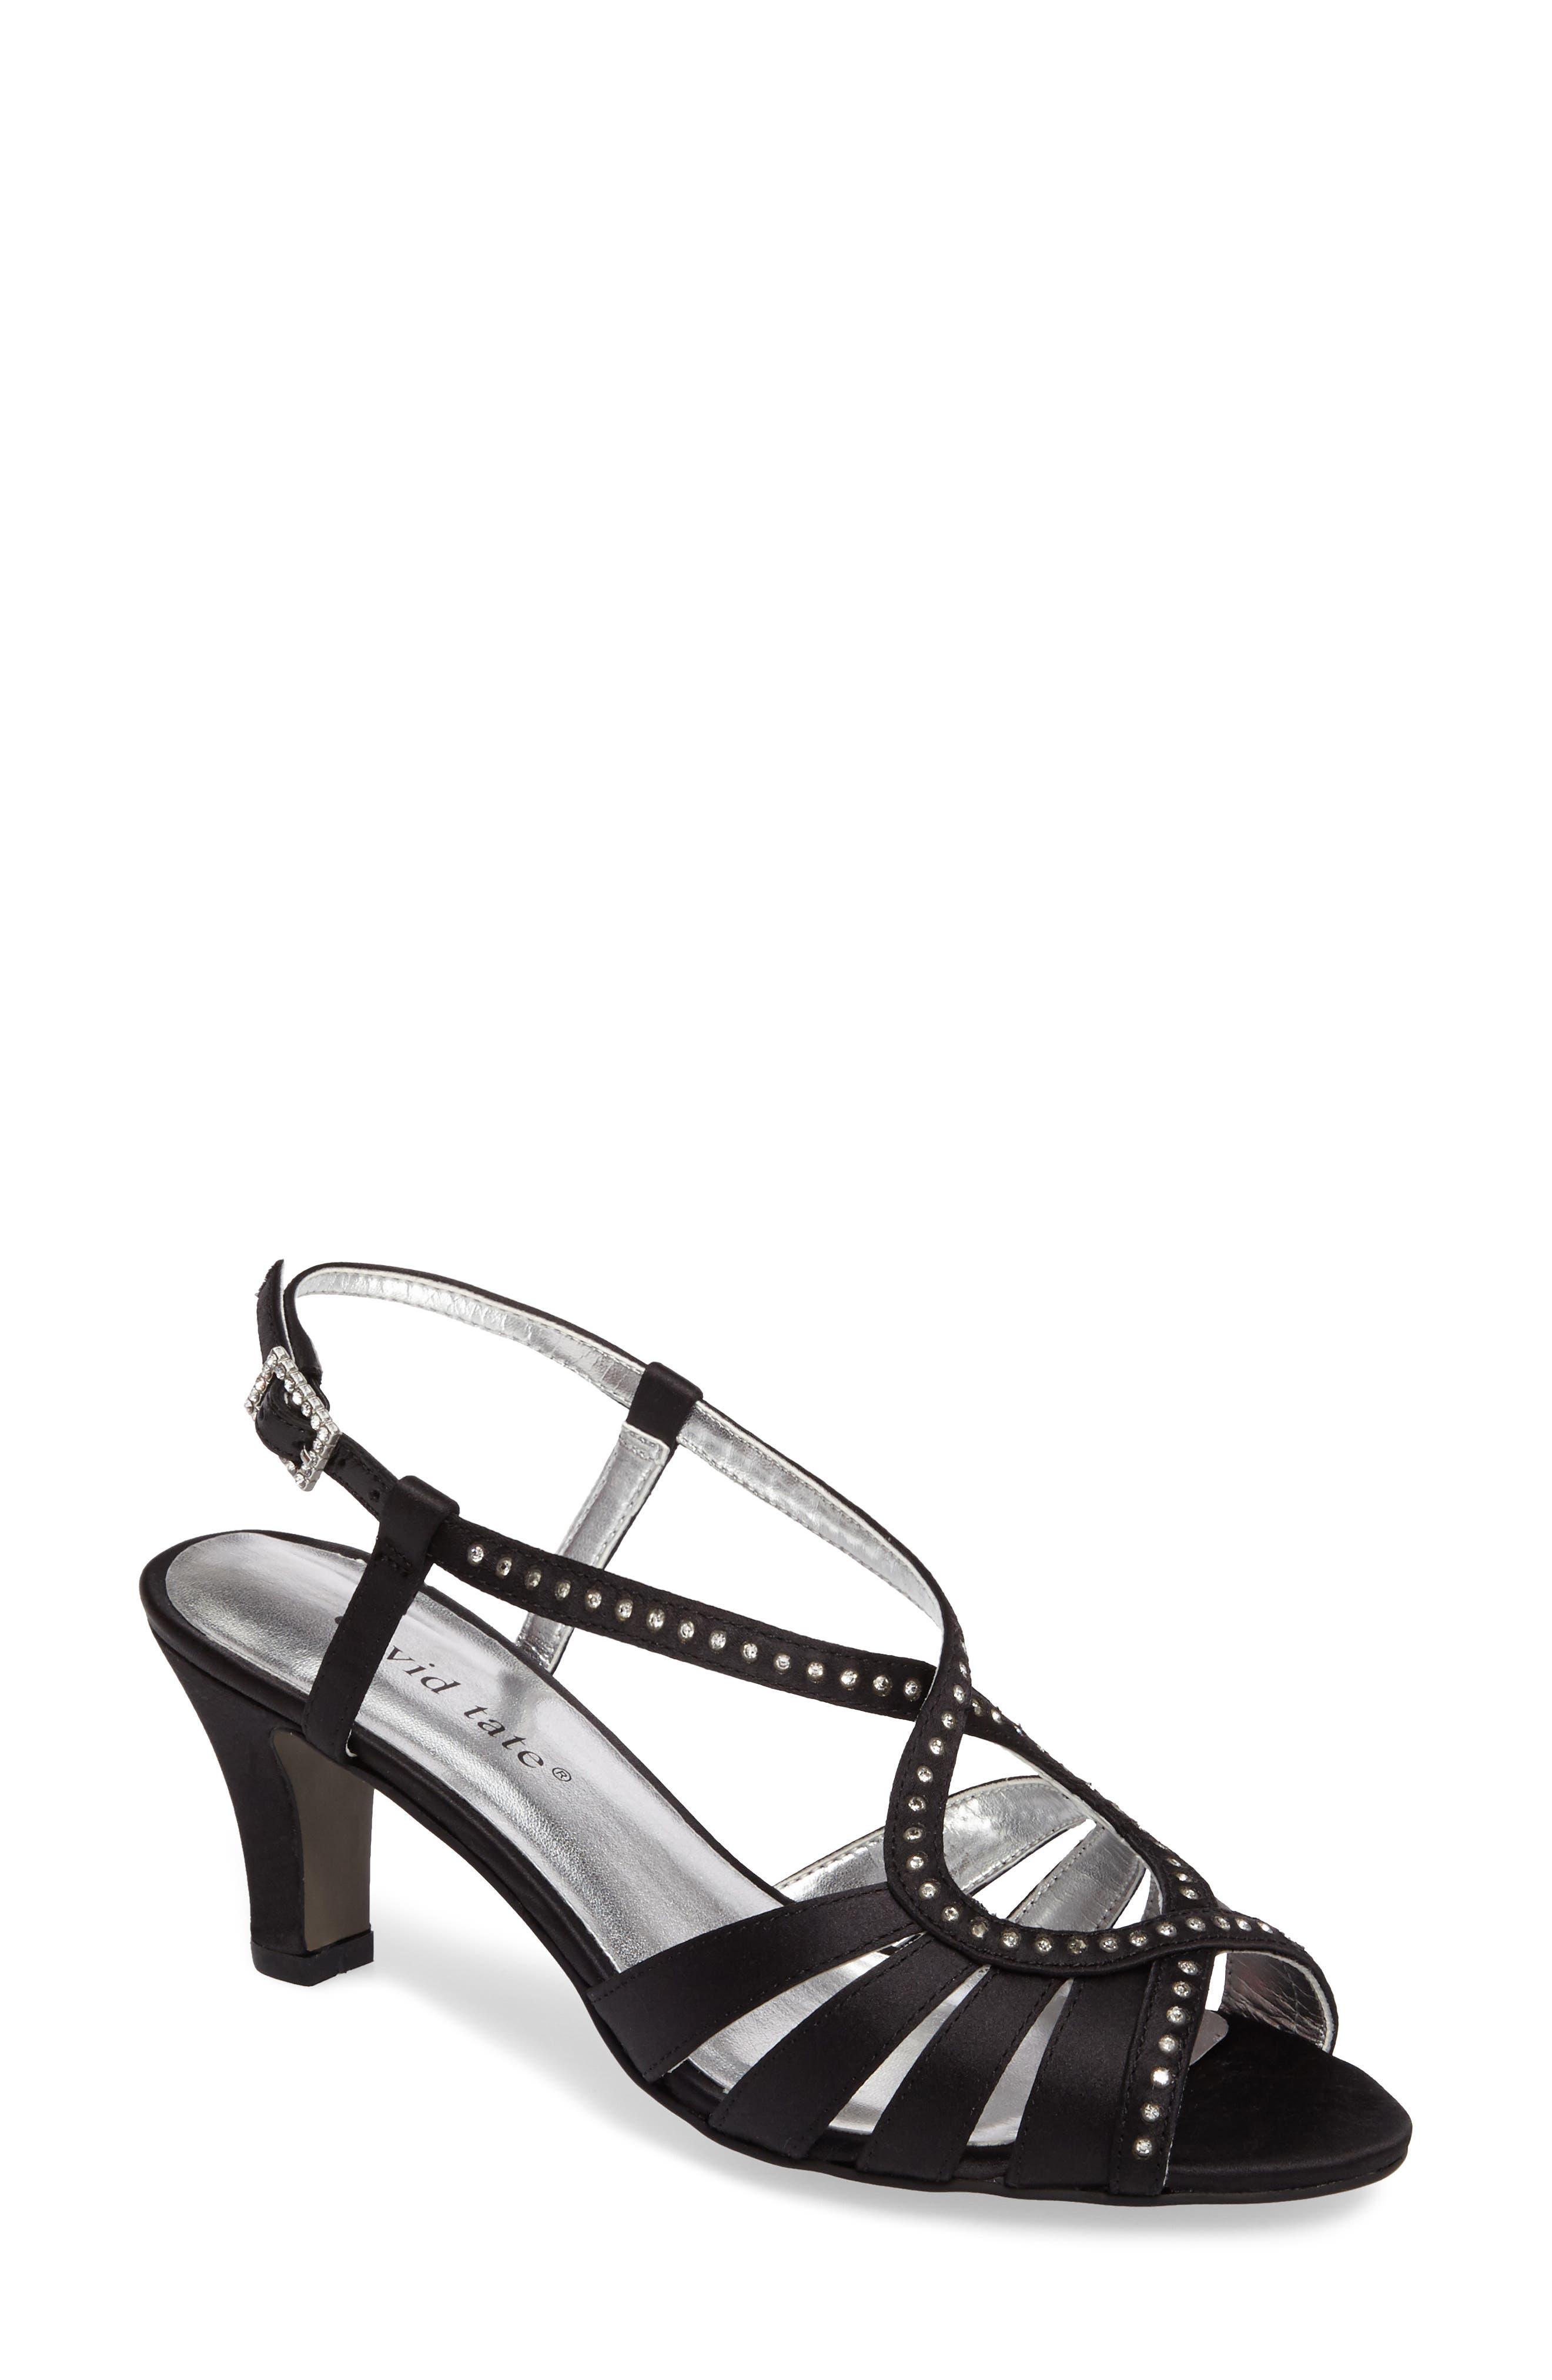 Whisper Slingback Sandal,                         Main,                         color, Black Satin